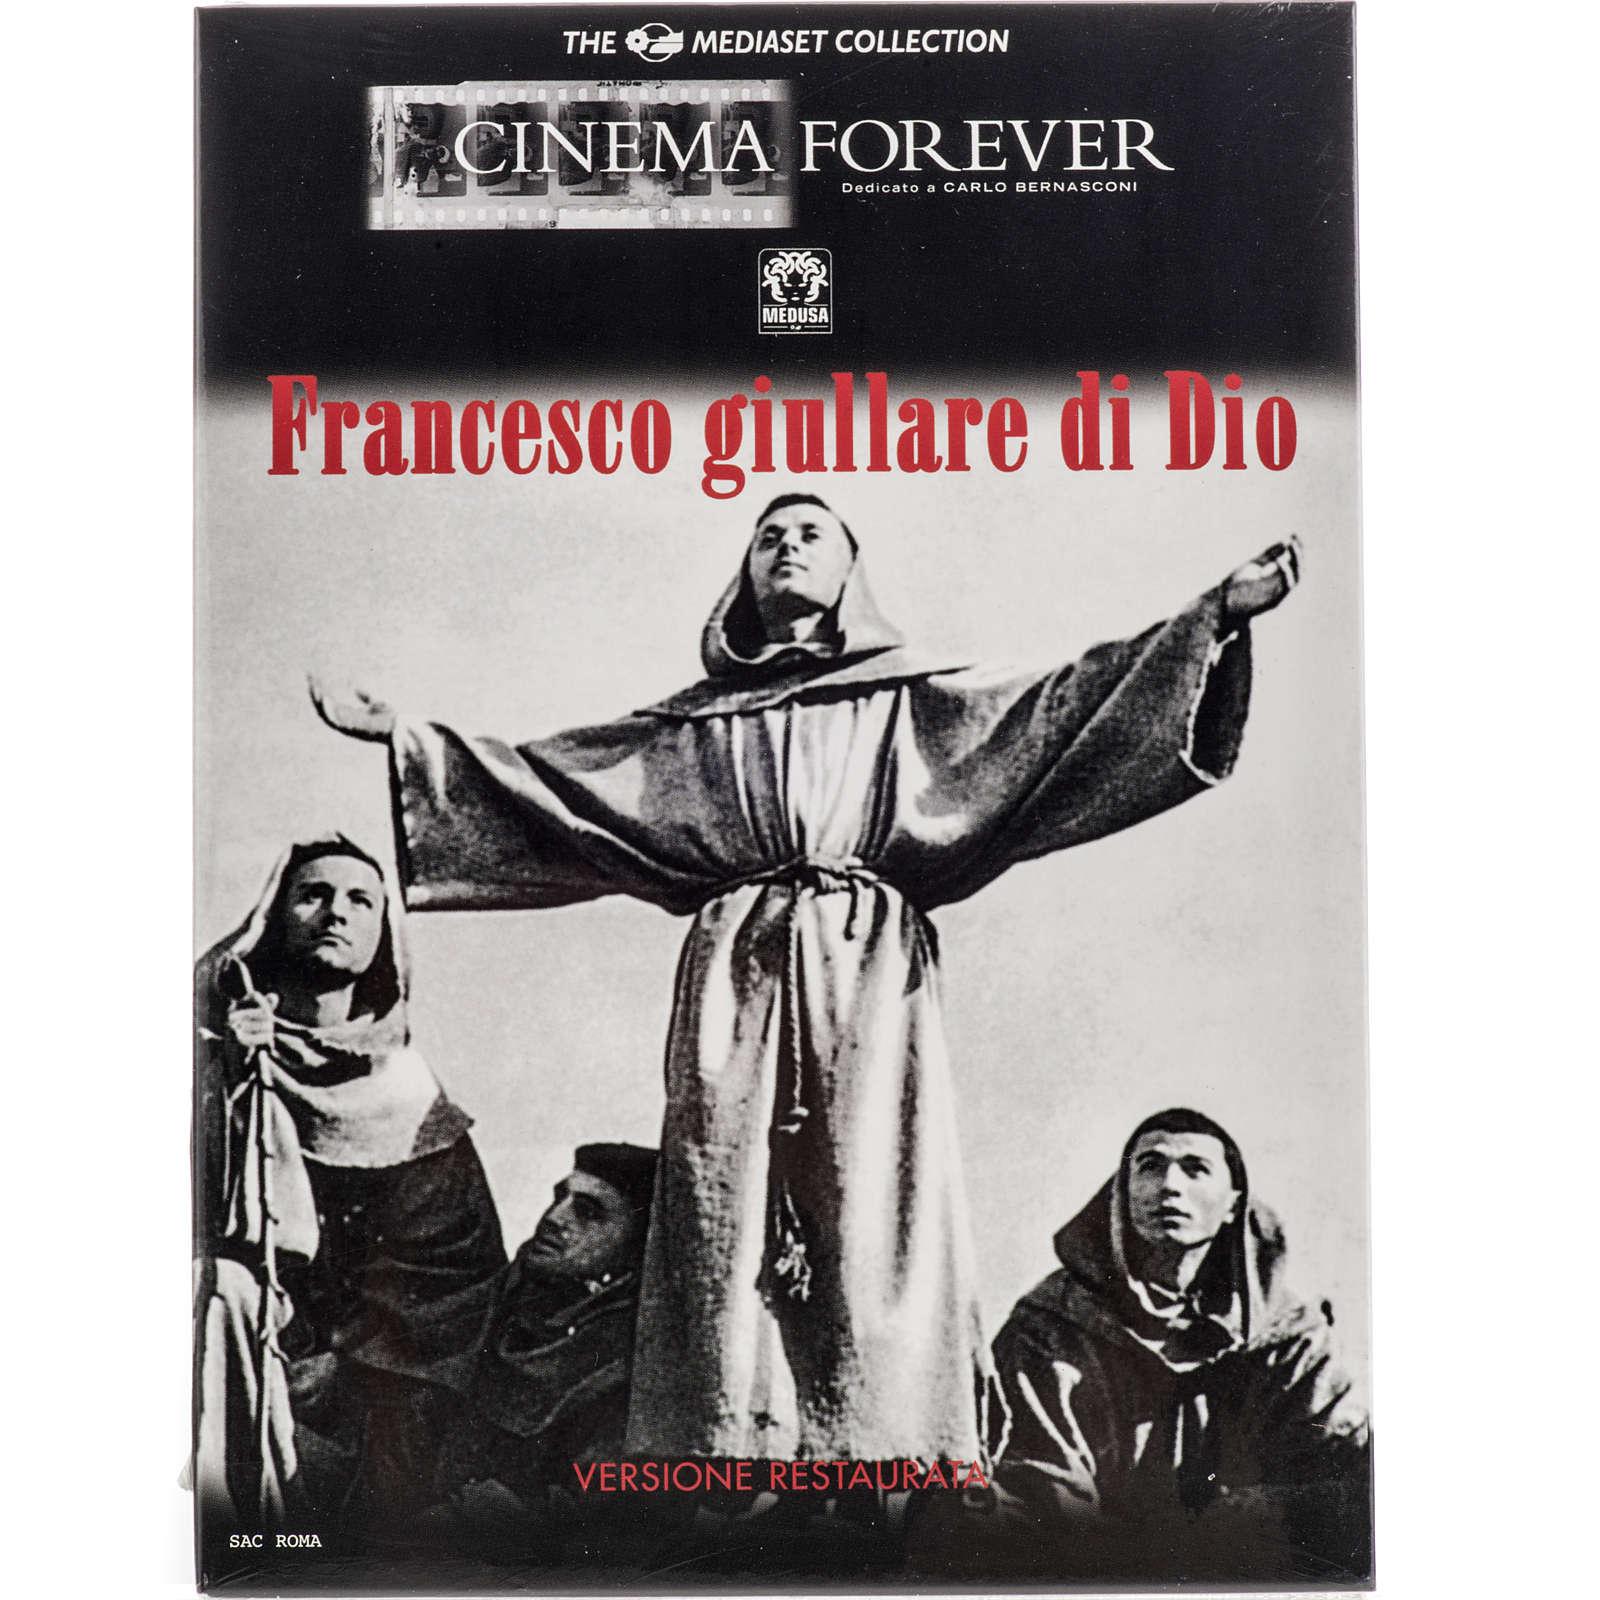 Francesco giullare di Dio 3